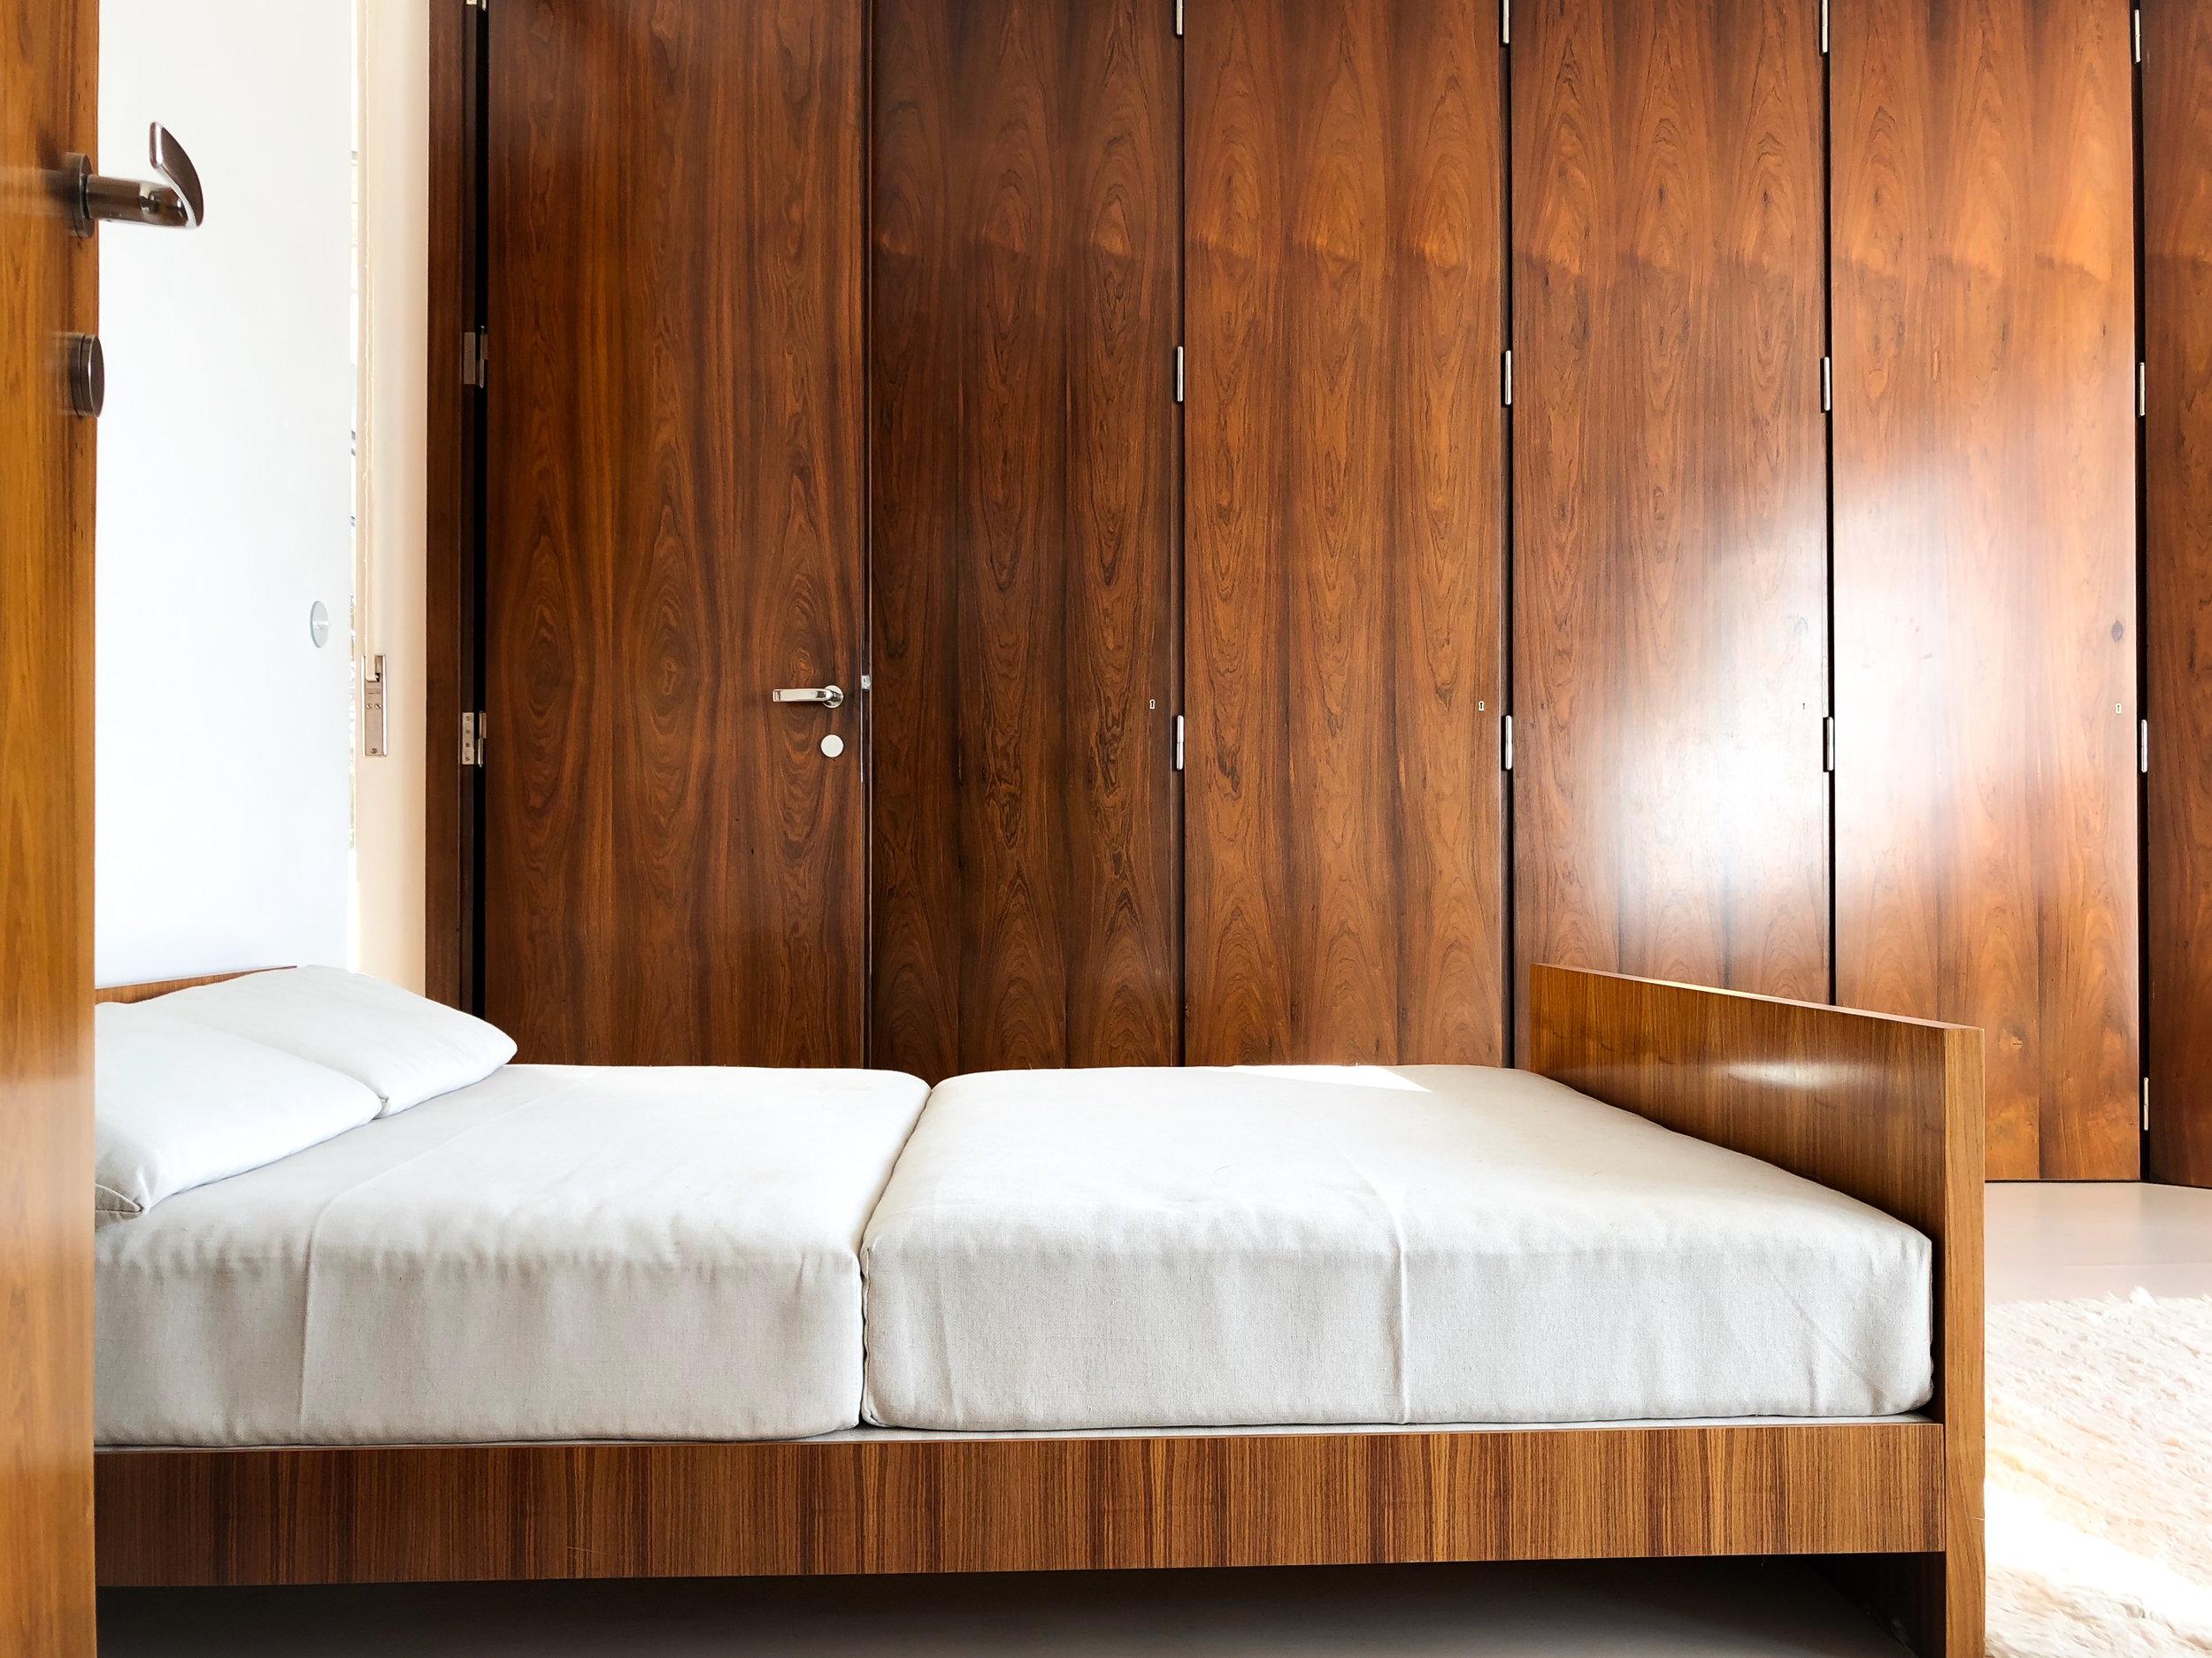 grete tugendhat's bedroom with built-in closets, rosewood veneer